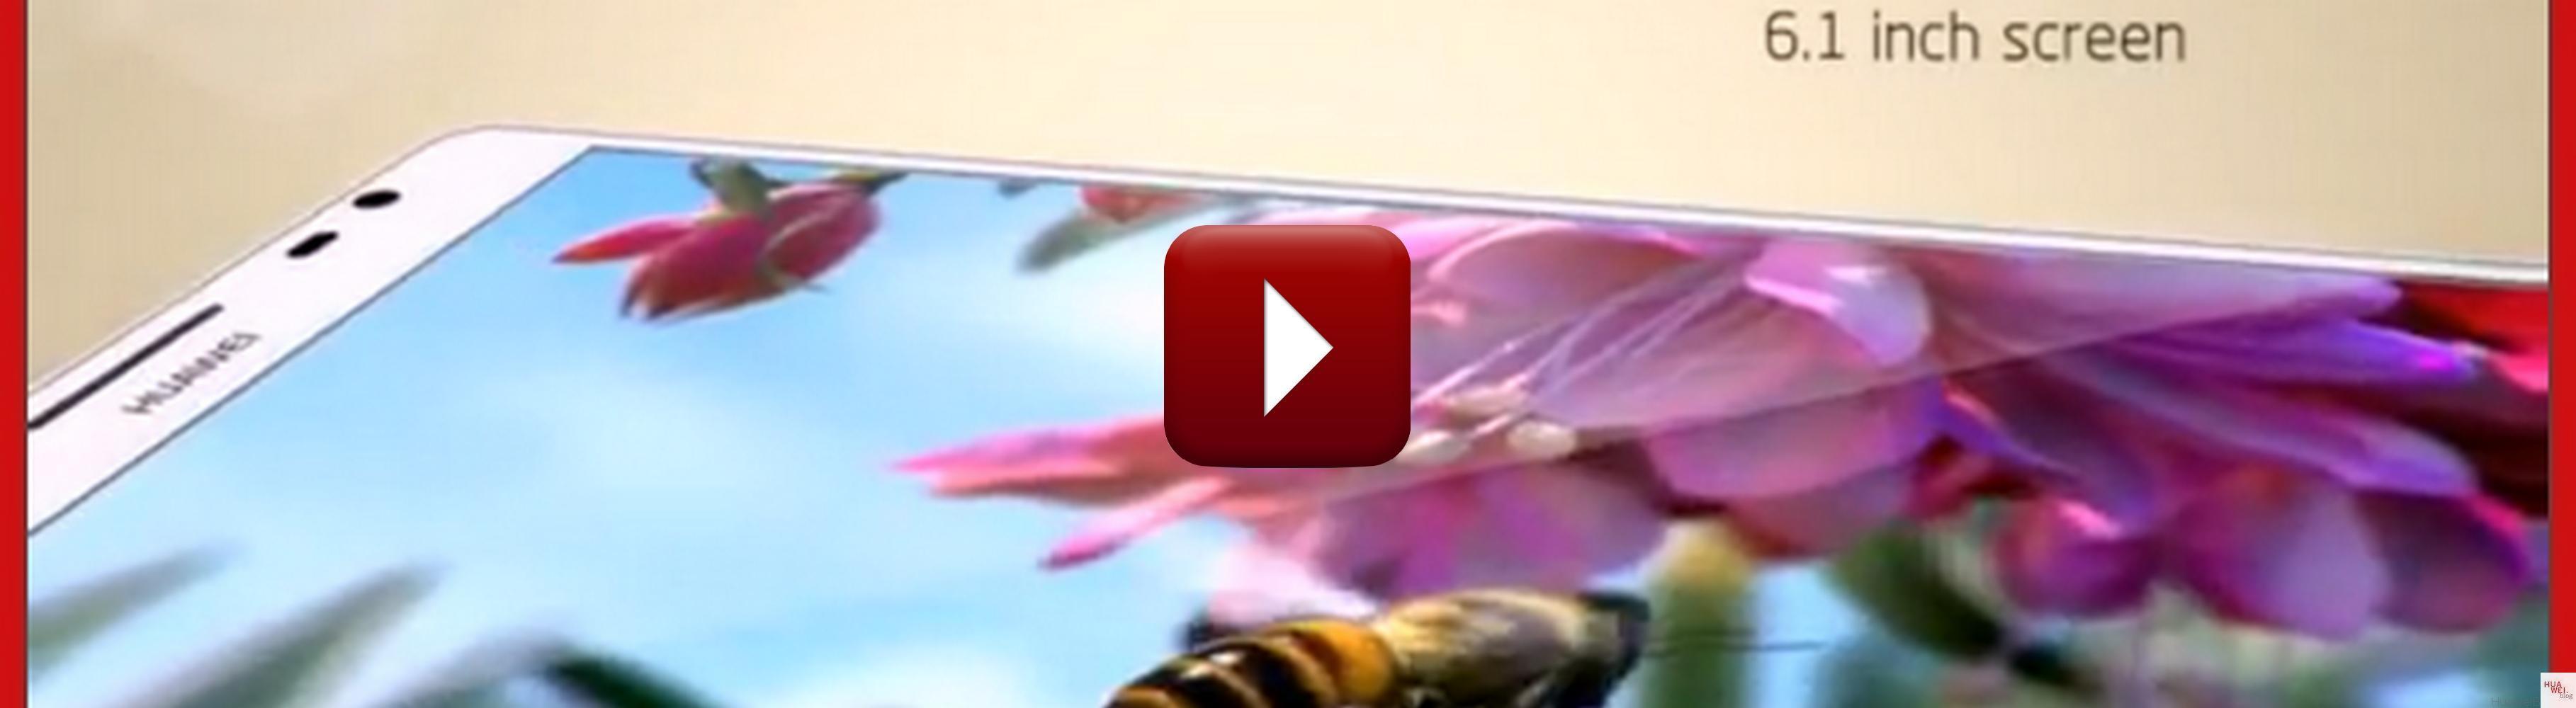 Huawei_Ascend_Mate_Video_Artikelbild